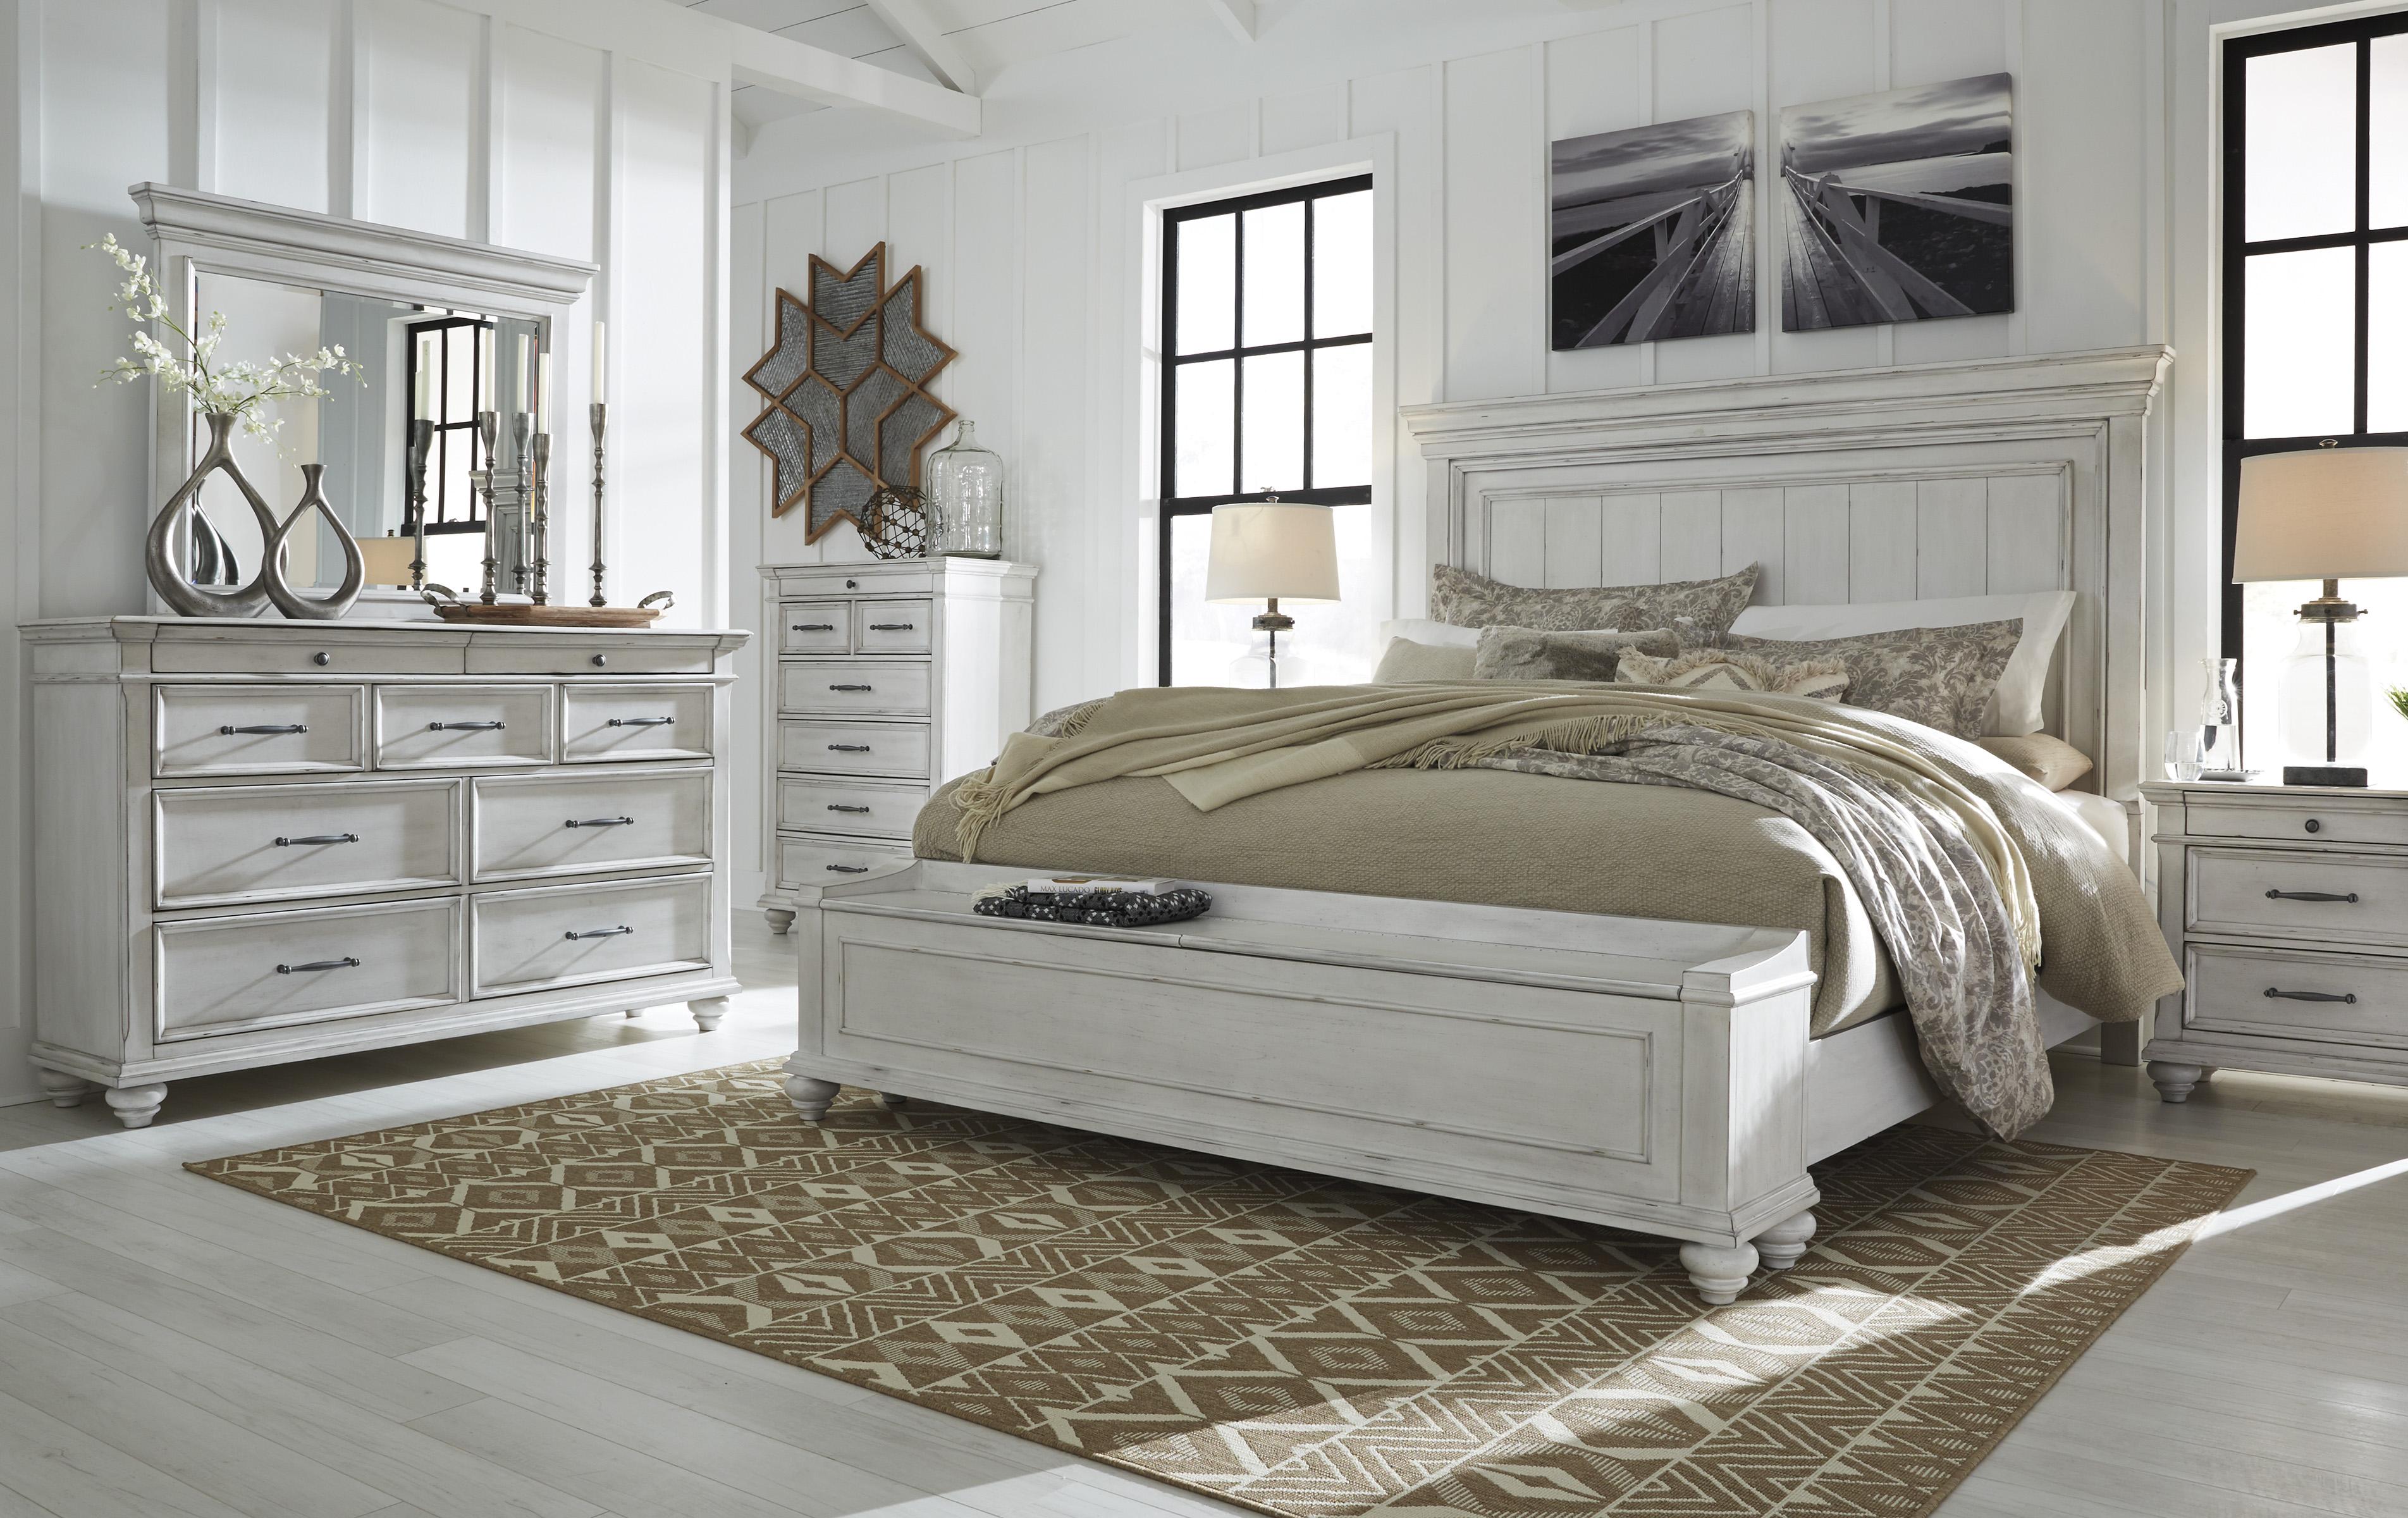 Mattress Furniture For Less San Antonio Tx